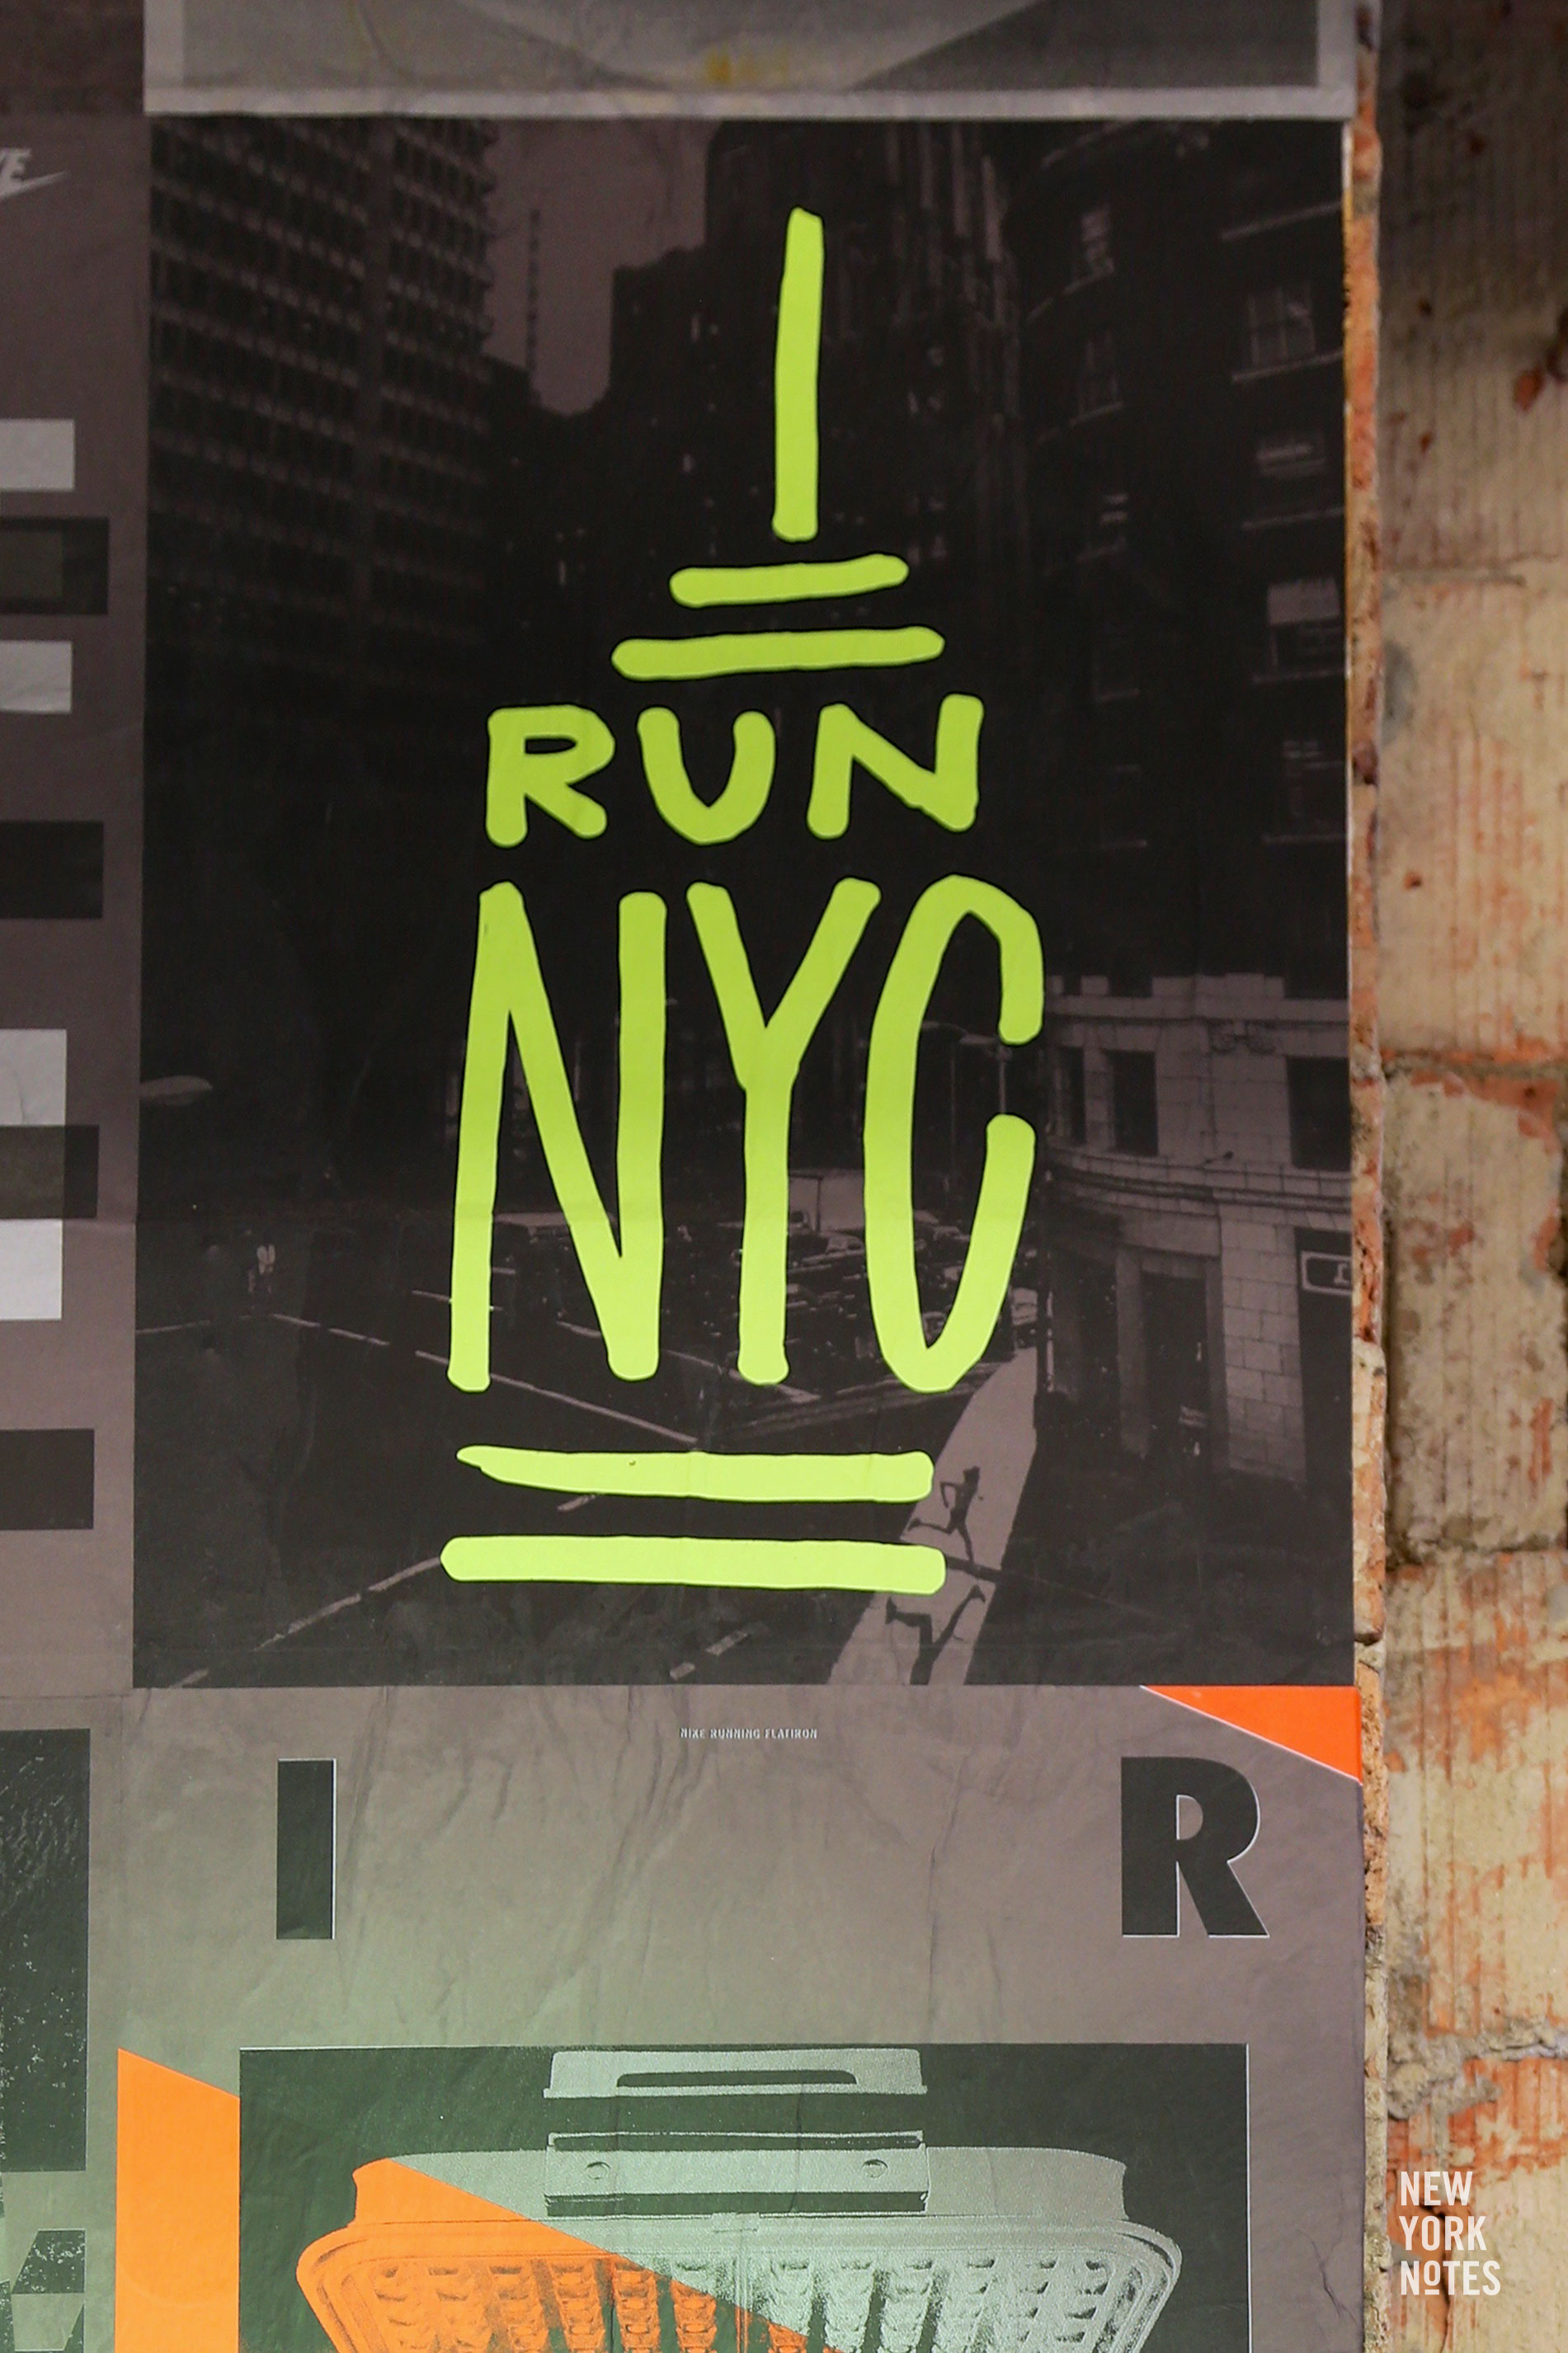 nike-run-club-nrc-i-run-ny.jpg